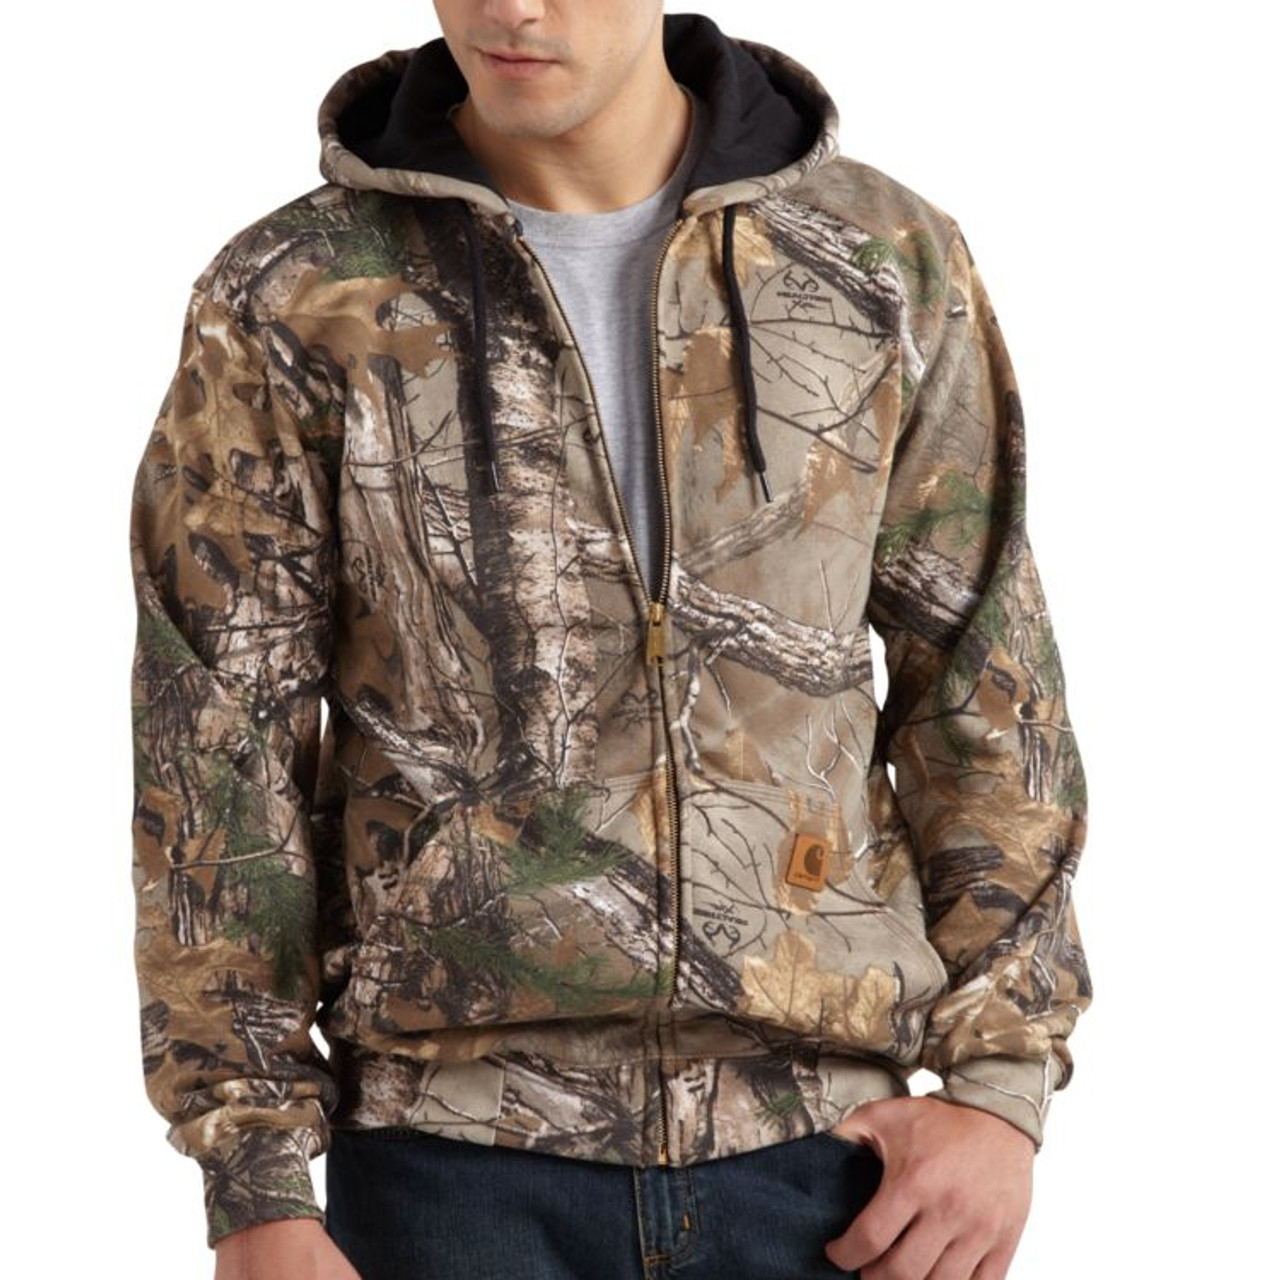 82952f1f7e Carhartt Midweight Realtree Xtra Hooded Zipper Sweatshirt - Herbert s Boots  and Western Wear